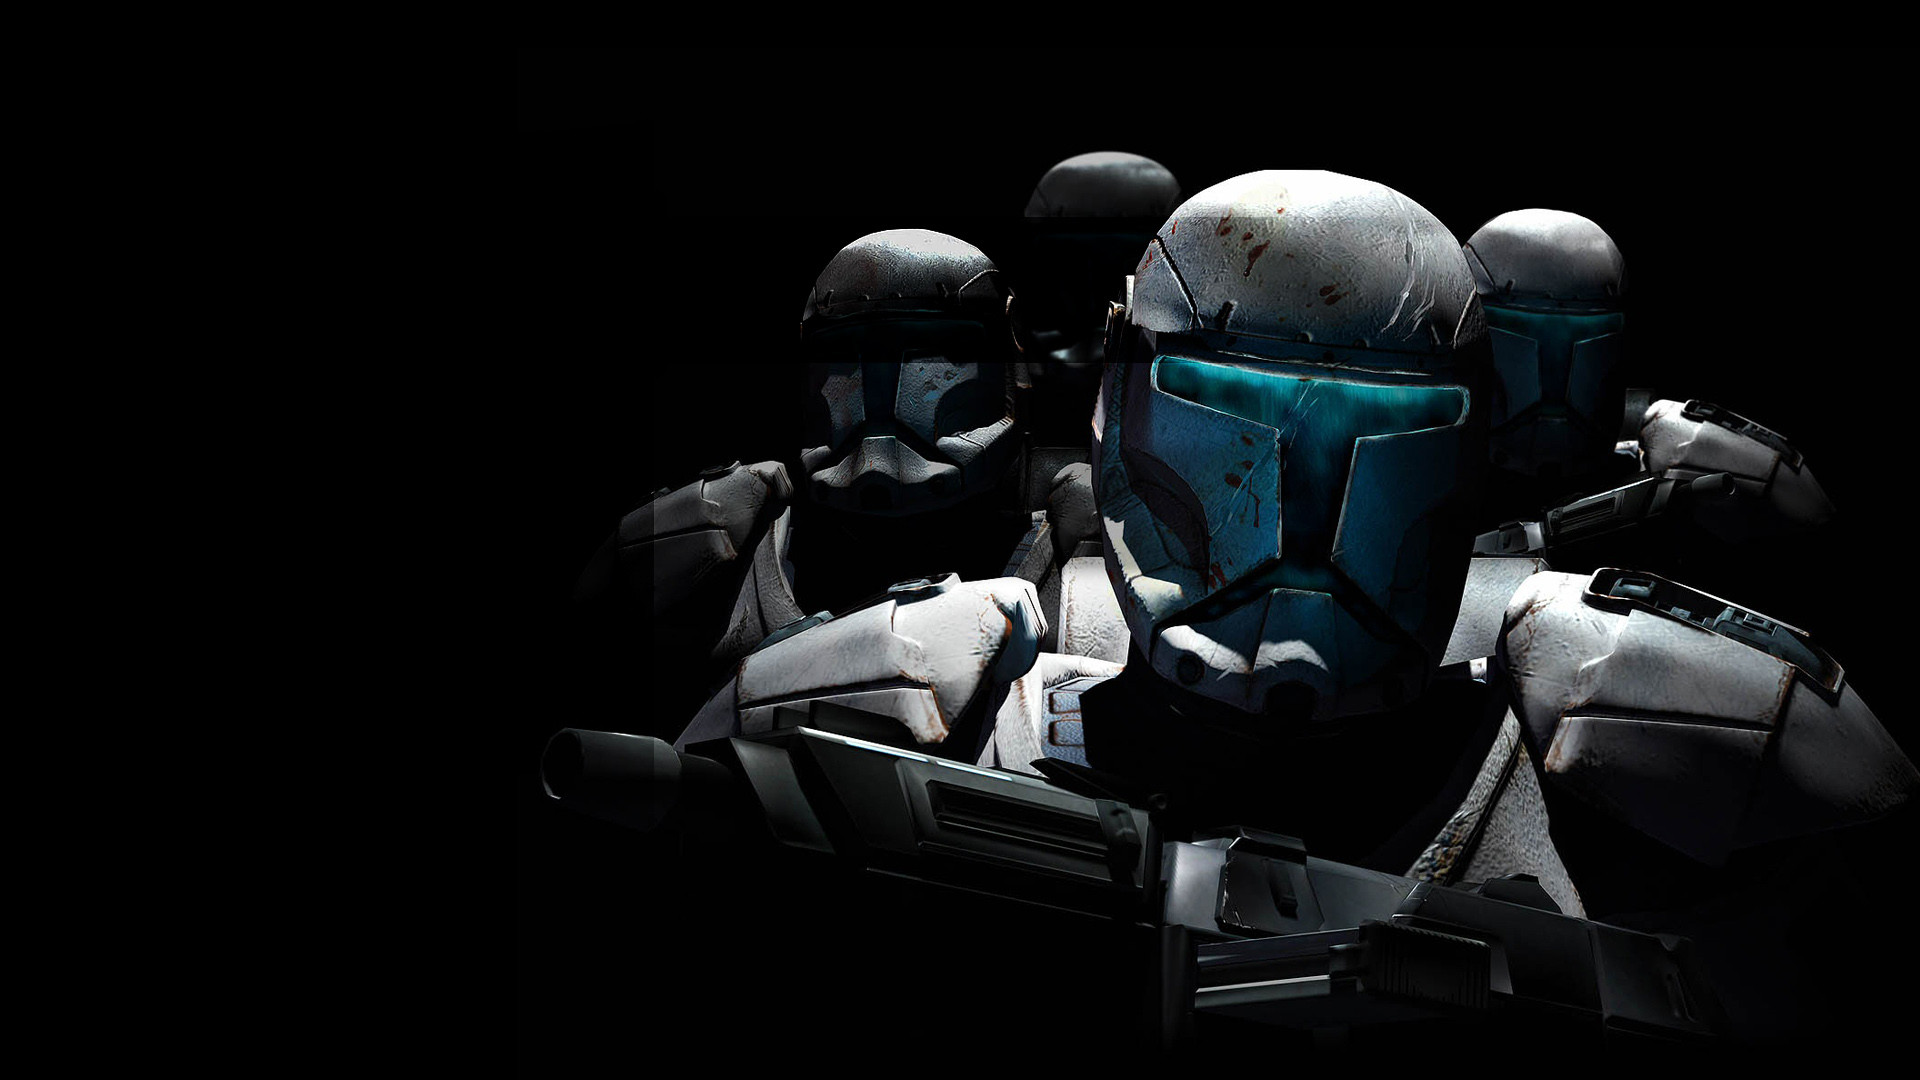 Star Wars 501st Wallpaper Wallpapertag